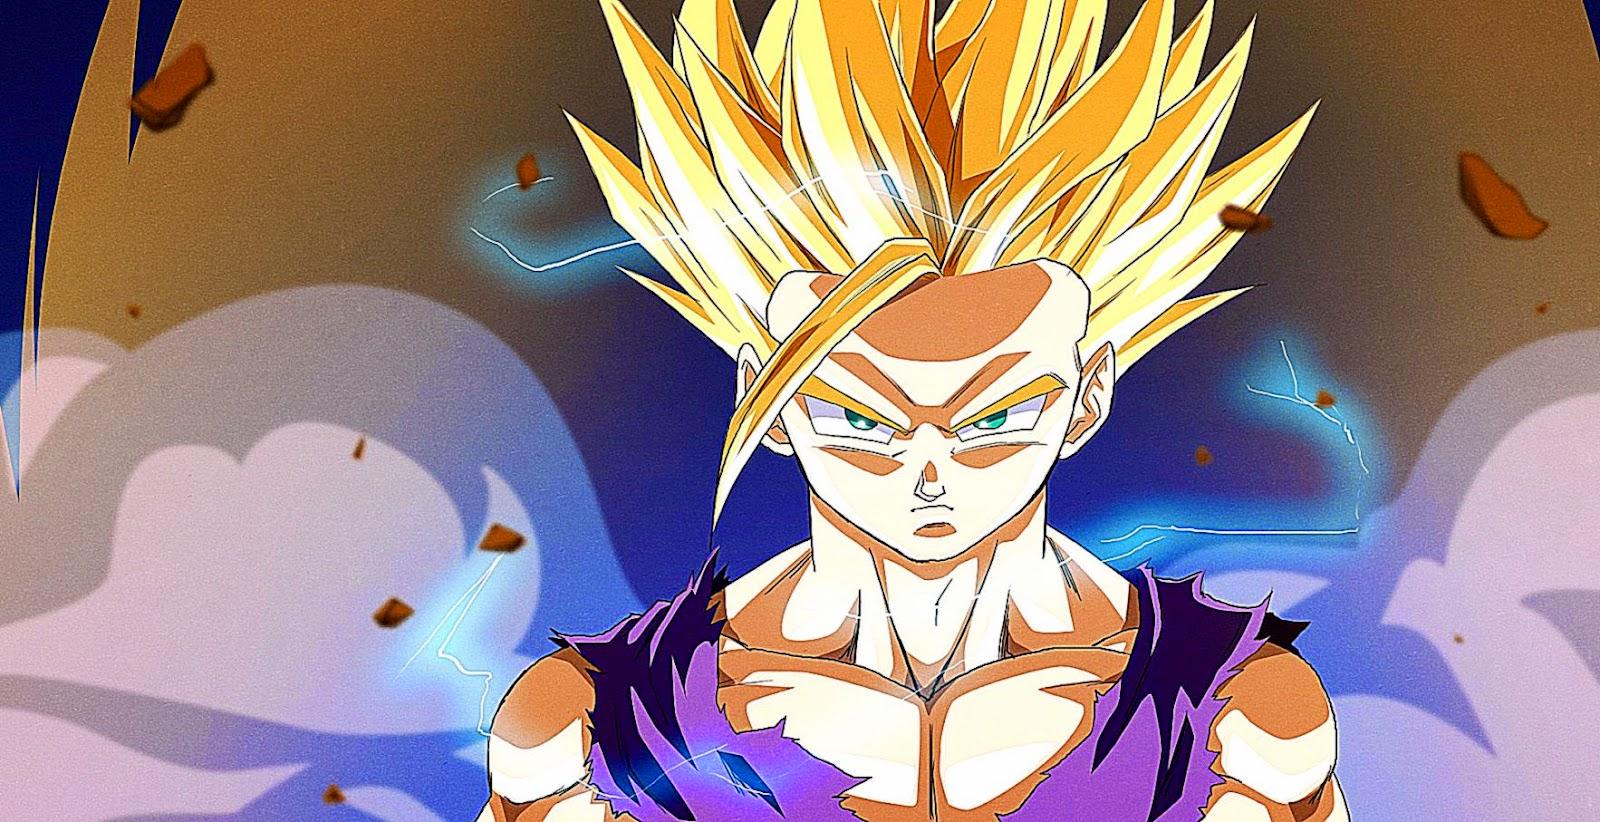 Dragon Ball Z Wallpaper 1080p Goku Hd Wallpaper Gallery